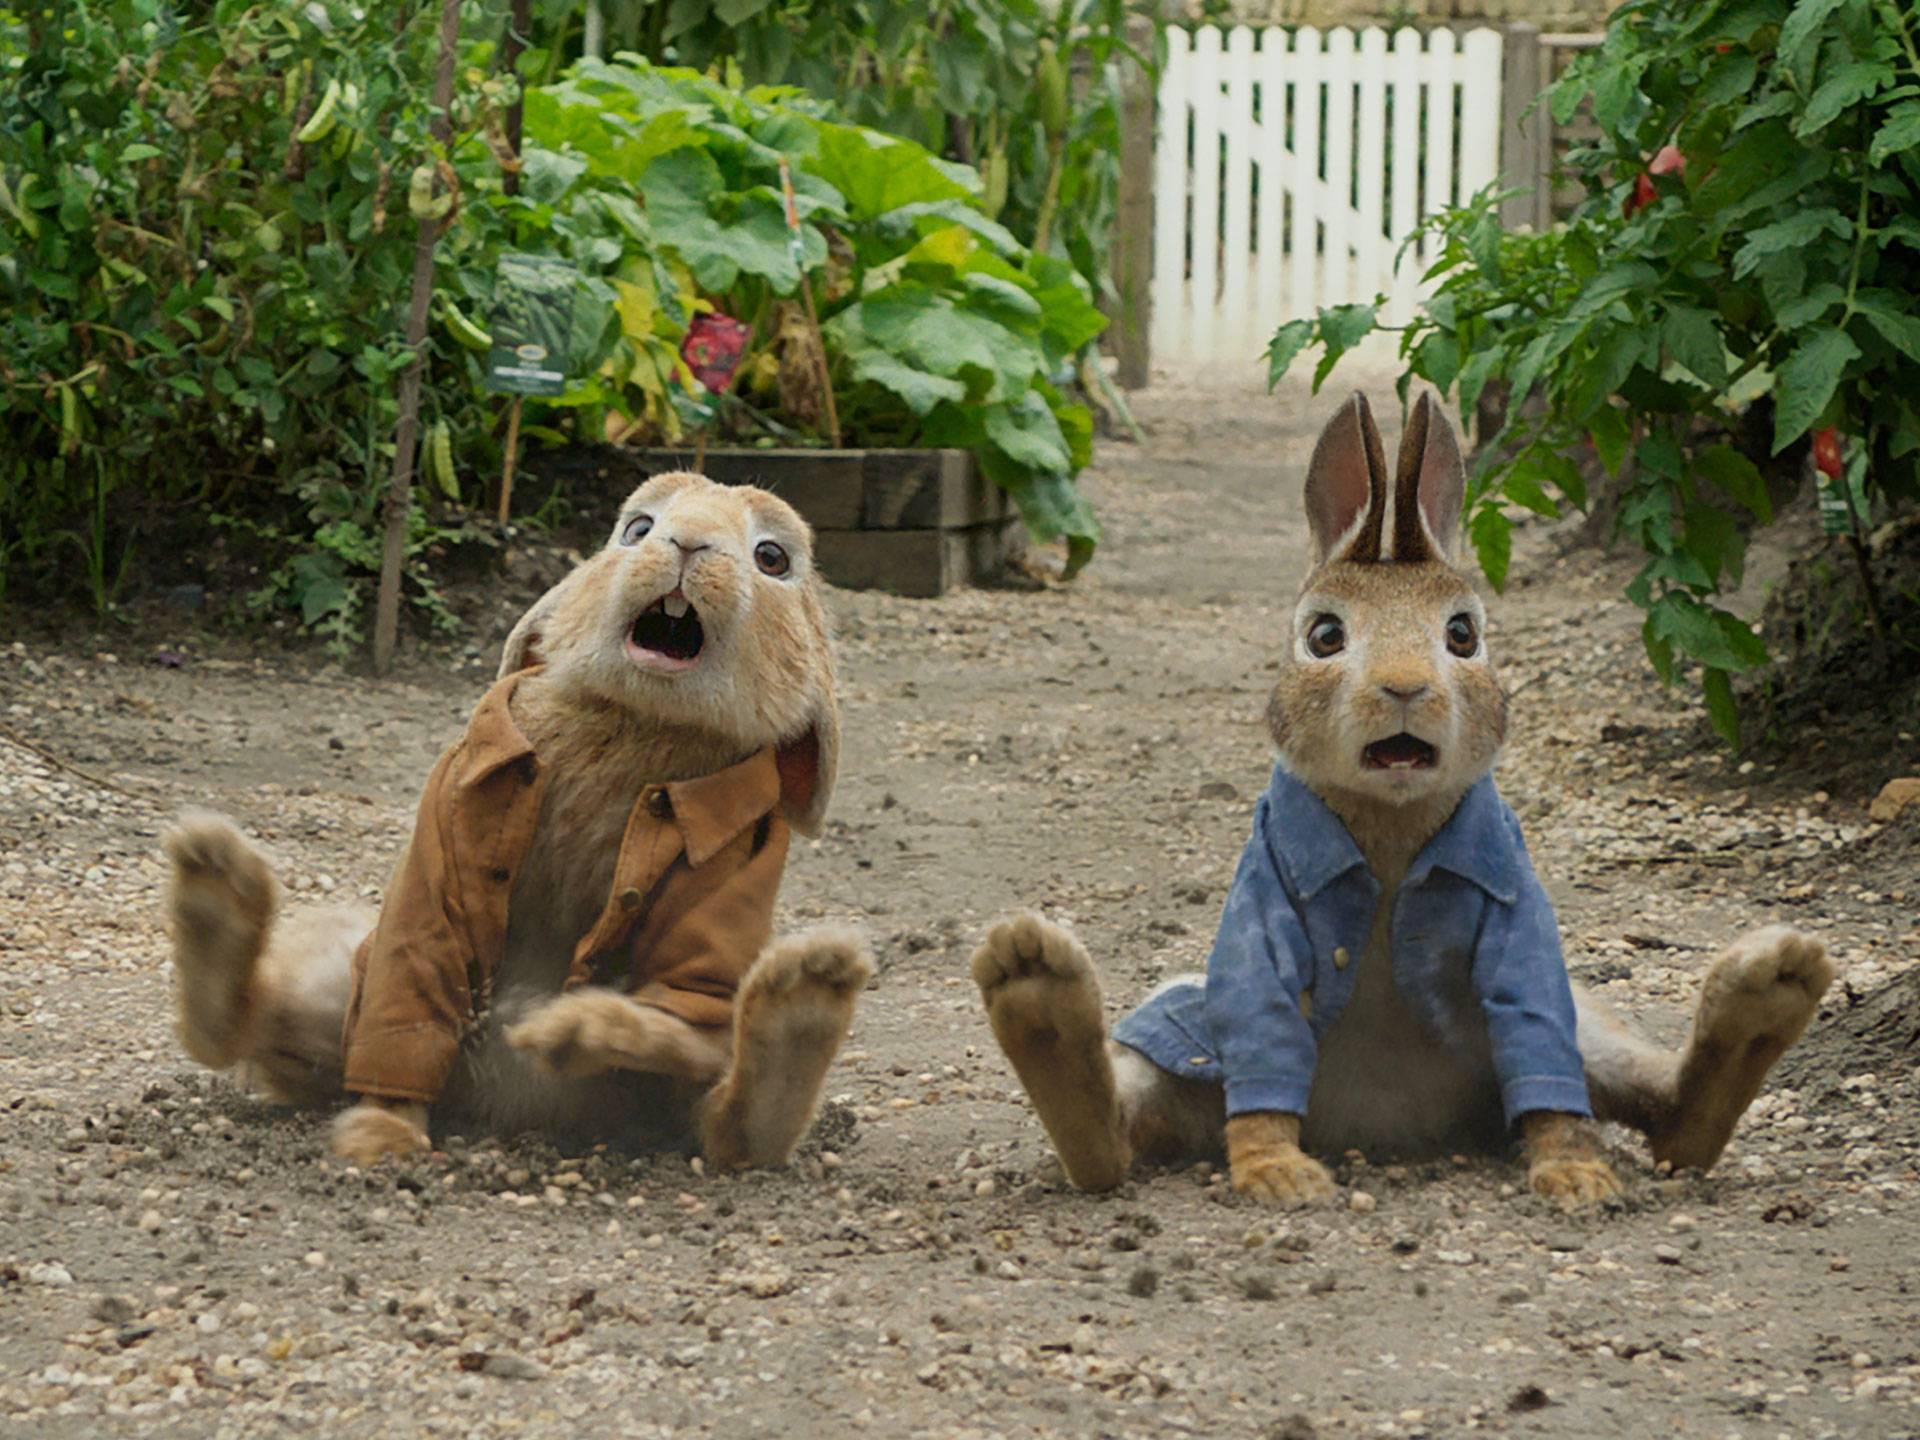 mgid:file:gsp:scenic:/international/nick-intl/images/series/orange-carpet/ep-24-peter-rabbit/peter-rabbit-07.jpg